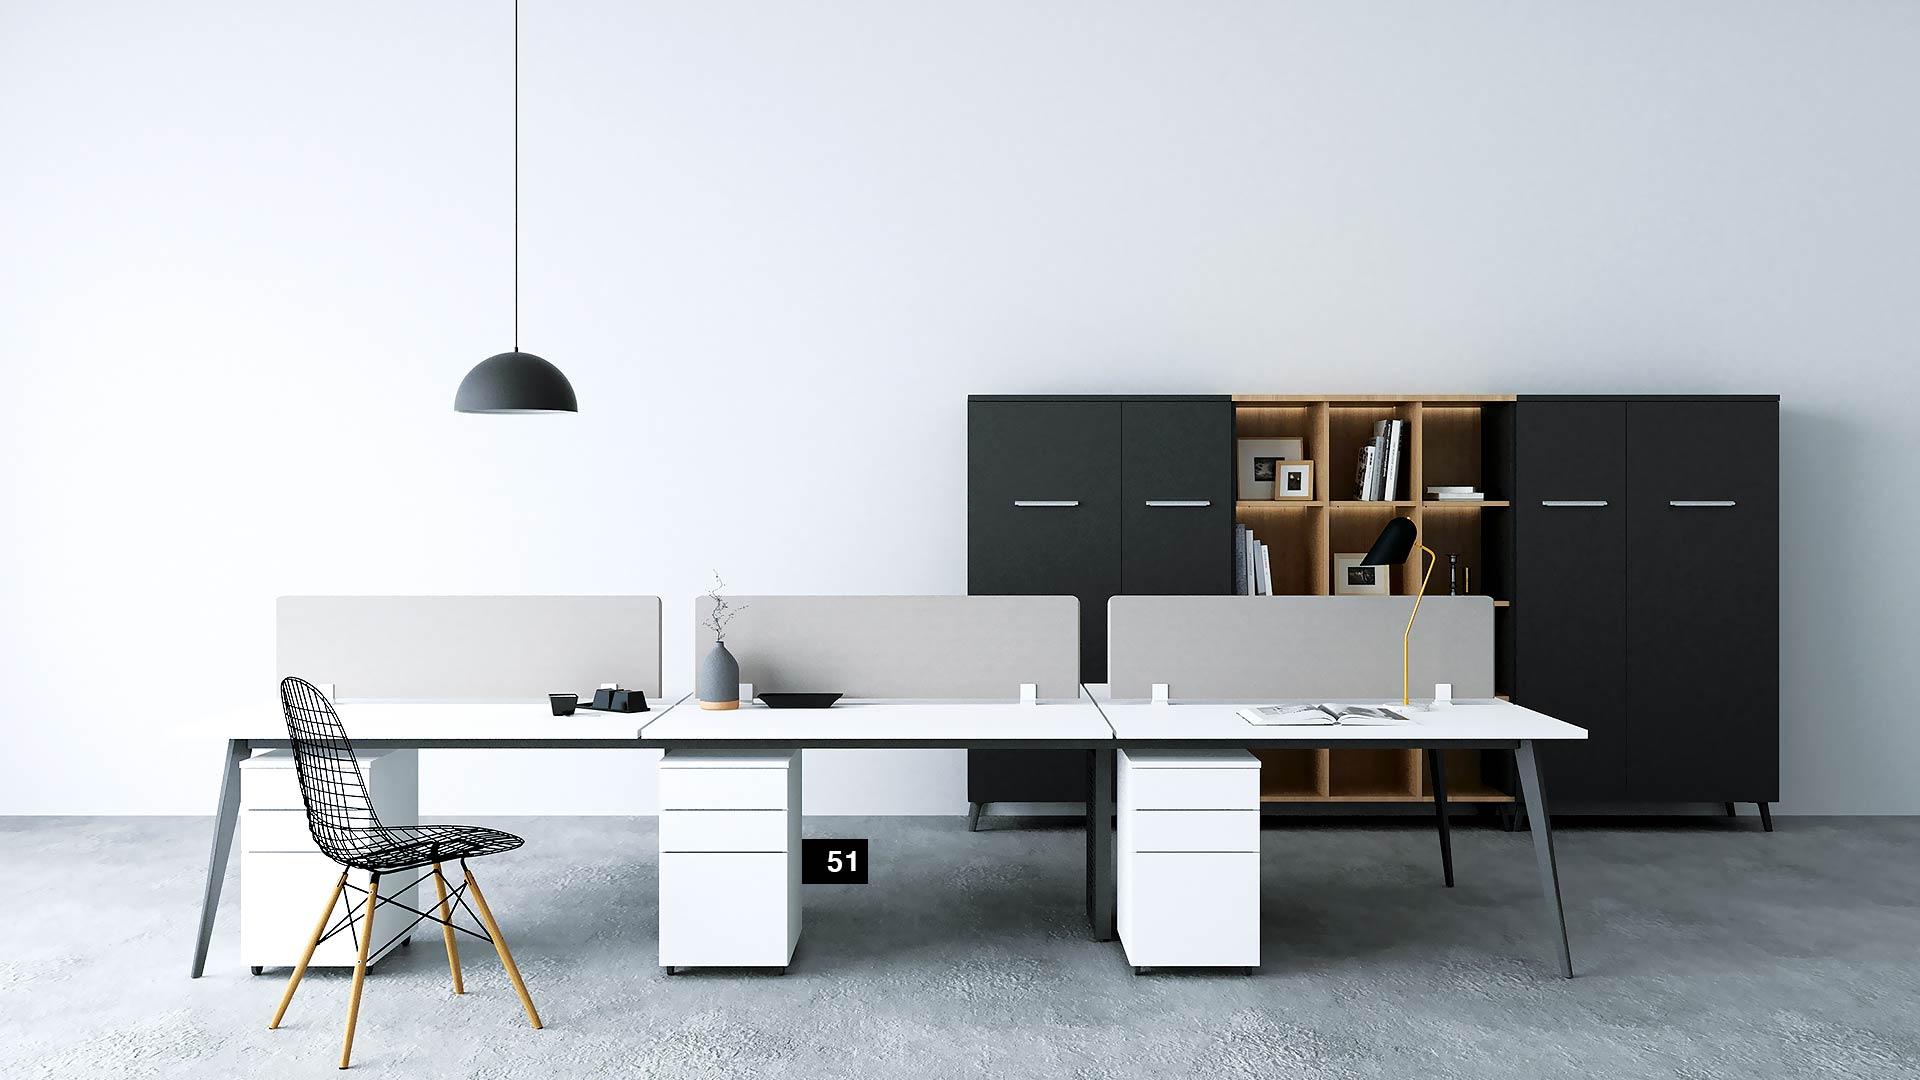 open-plan-benching-friant-dash-revitalize-2